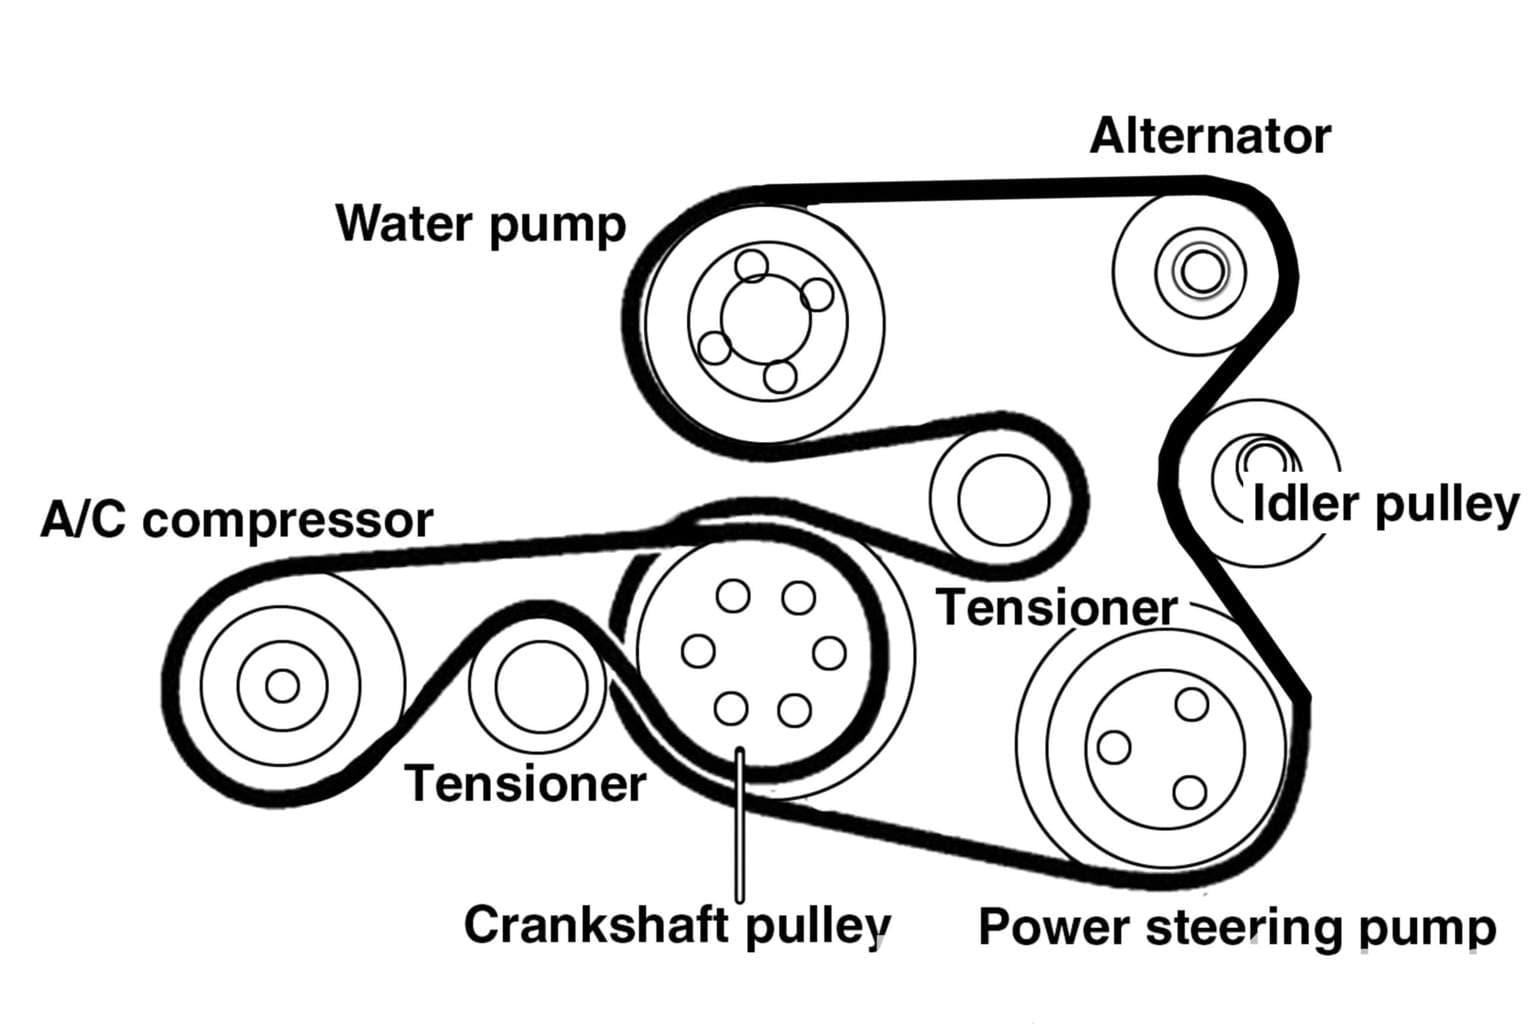 hight resolution of belt diagram bmw x3 wiring diagram data schema 2008 bmw x3 drive belt diagram 2008 x3 belt diagram